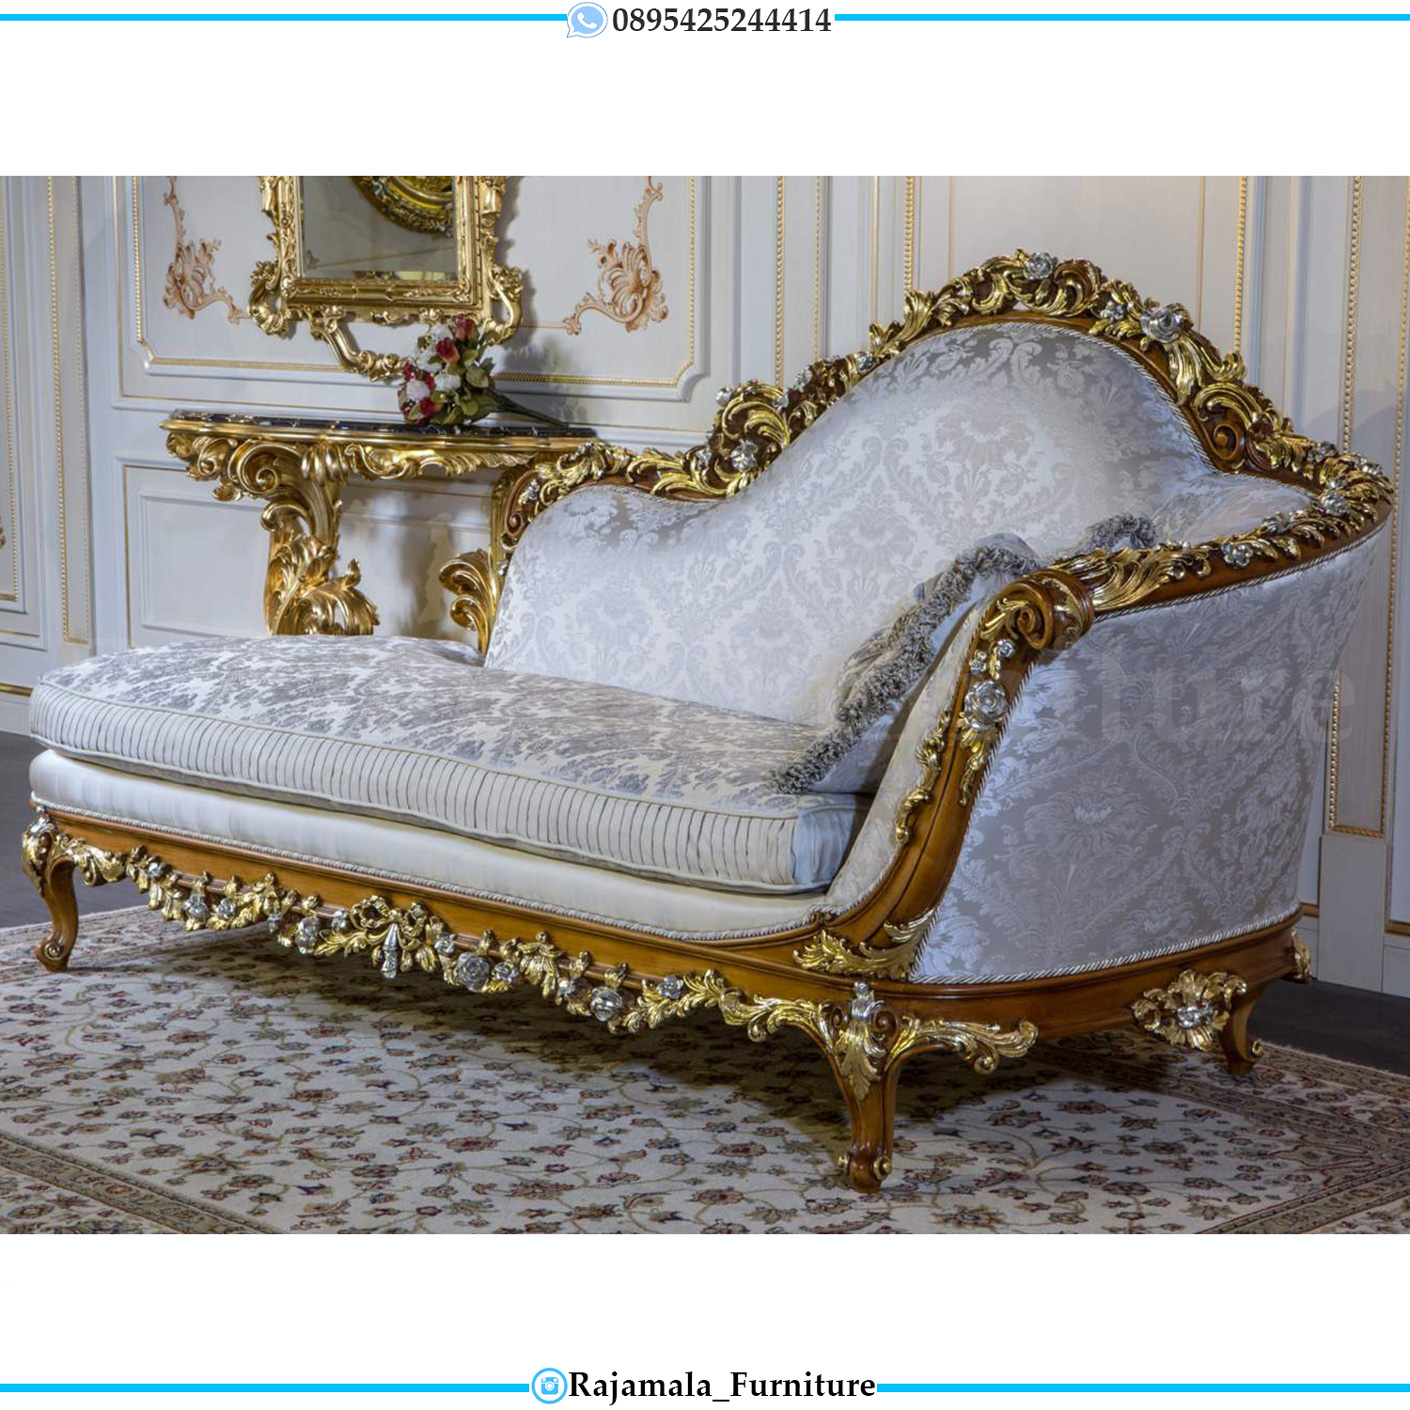 Sofa Santai Ukiran Luxury Baroque Italian Style Terbaru RM-0025